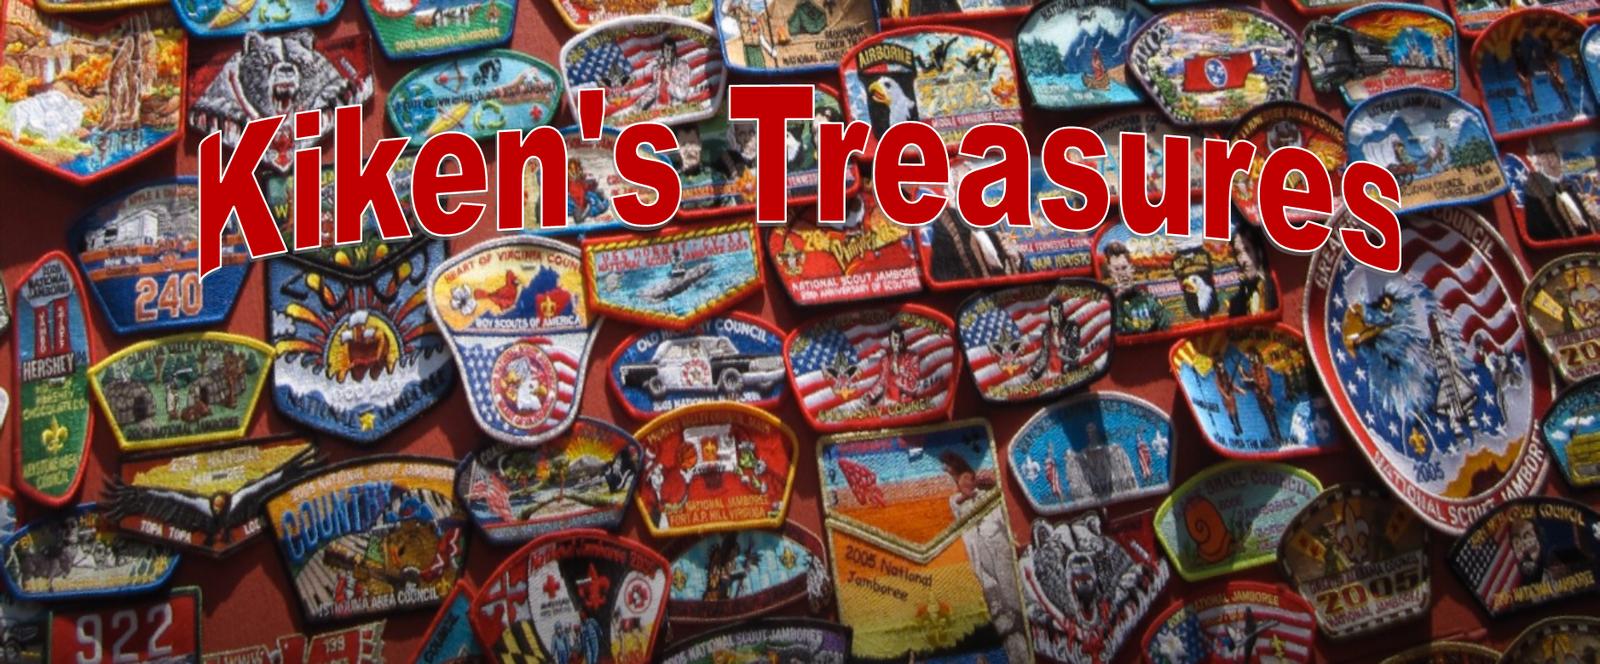 Kiken's Treasures